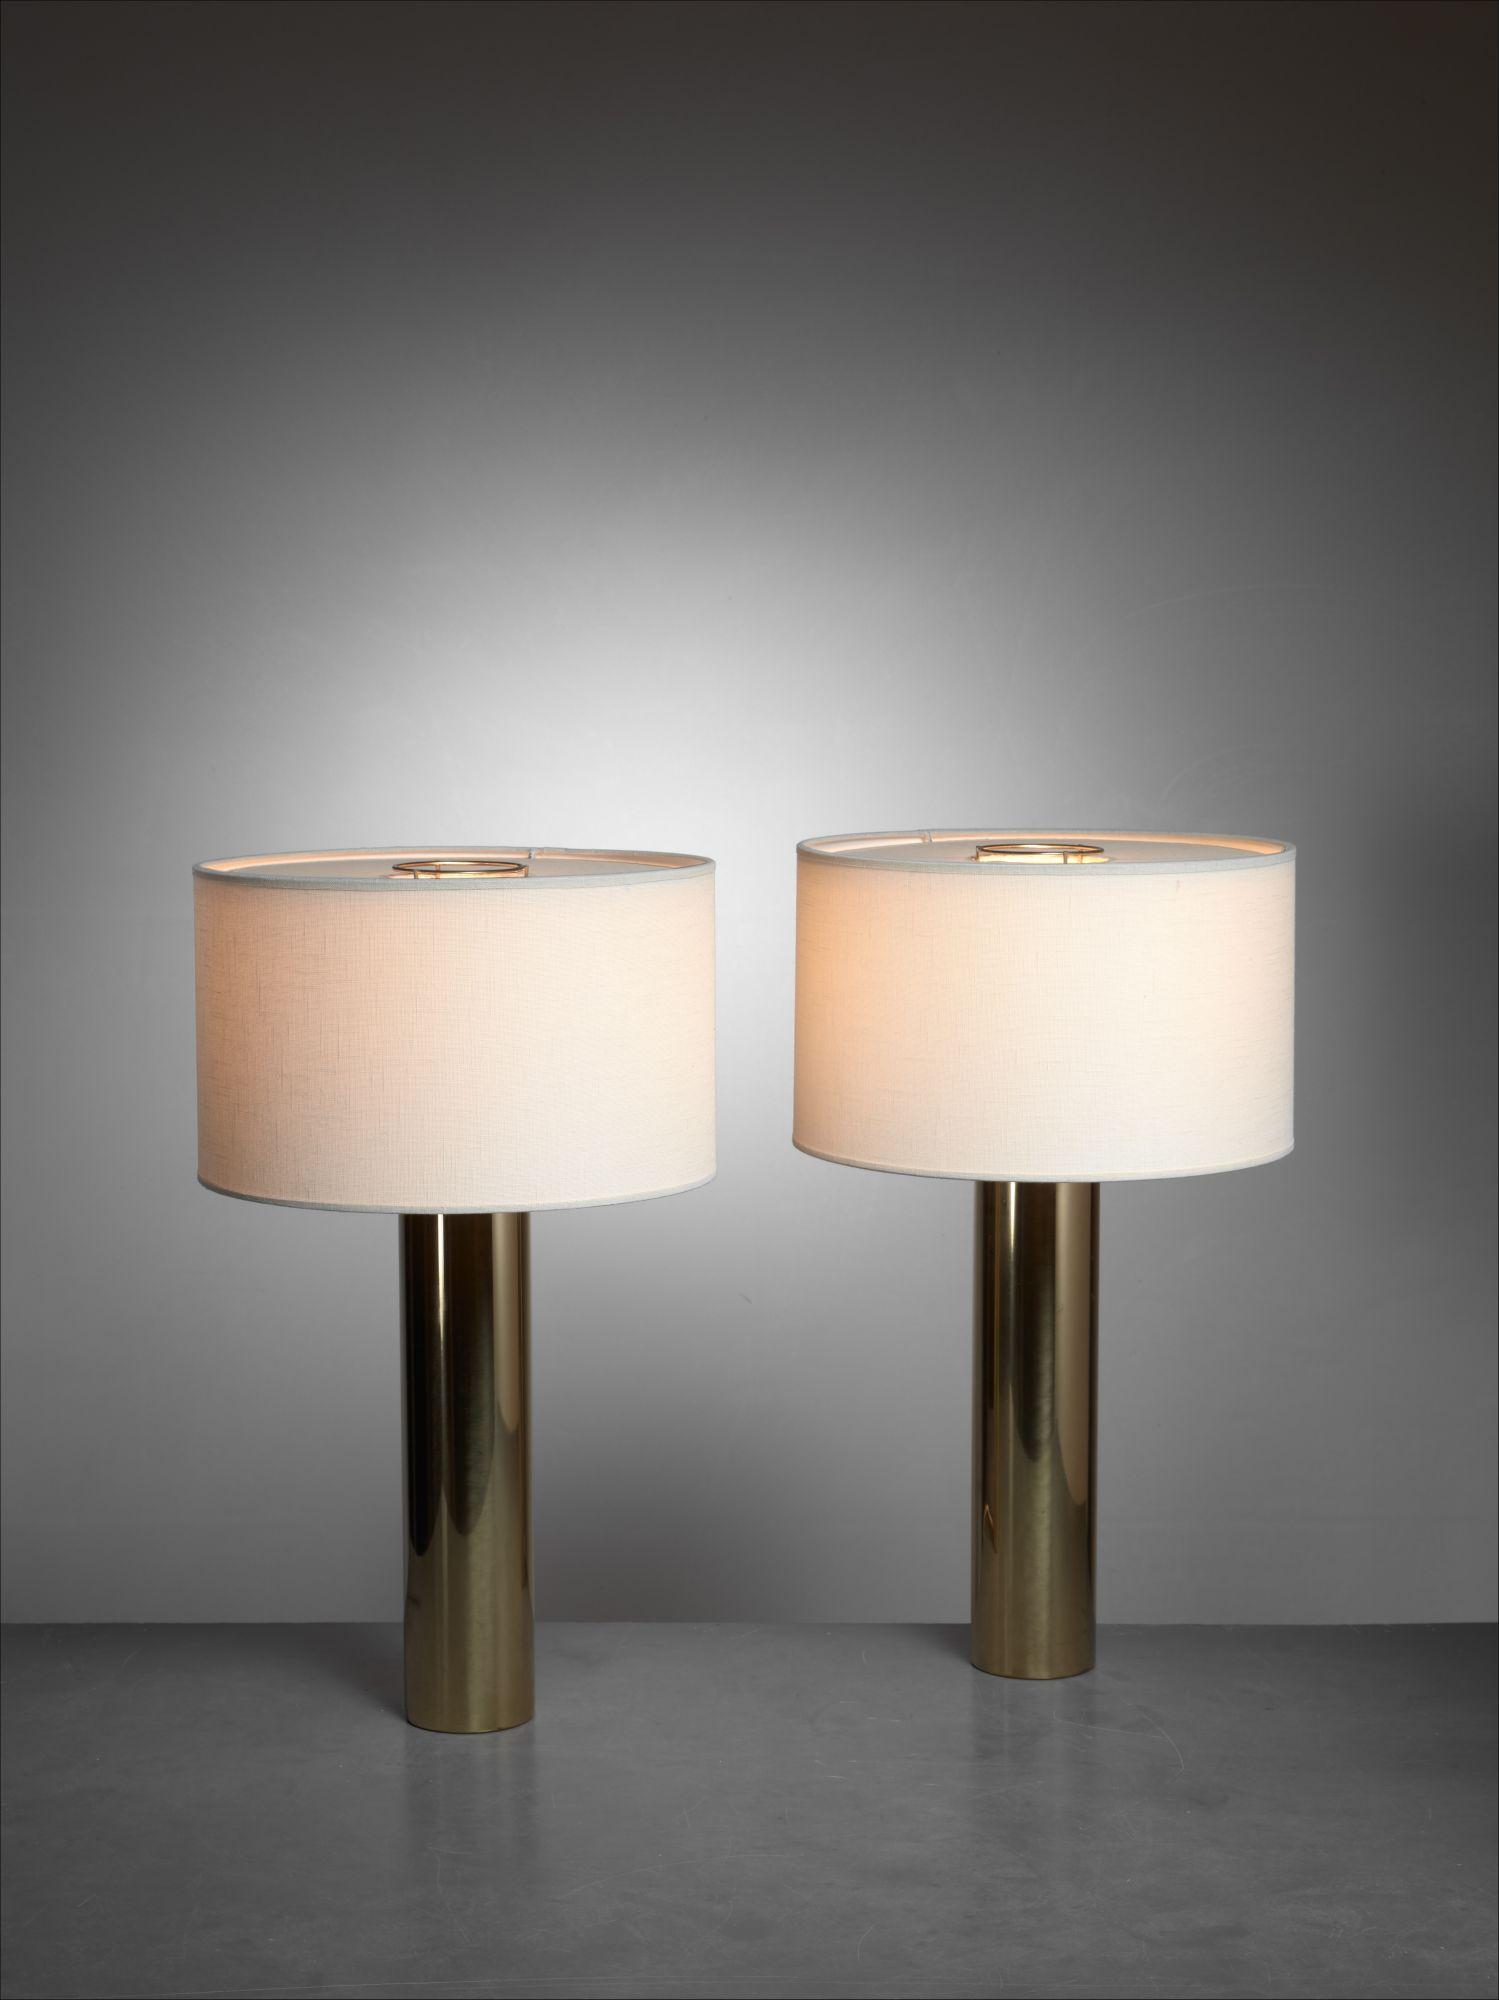 Falkenberg Brass Table Lamps Sweden 1950s